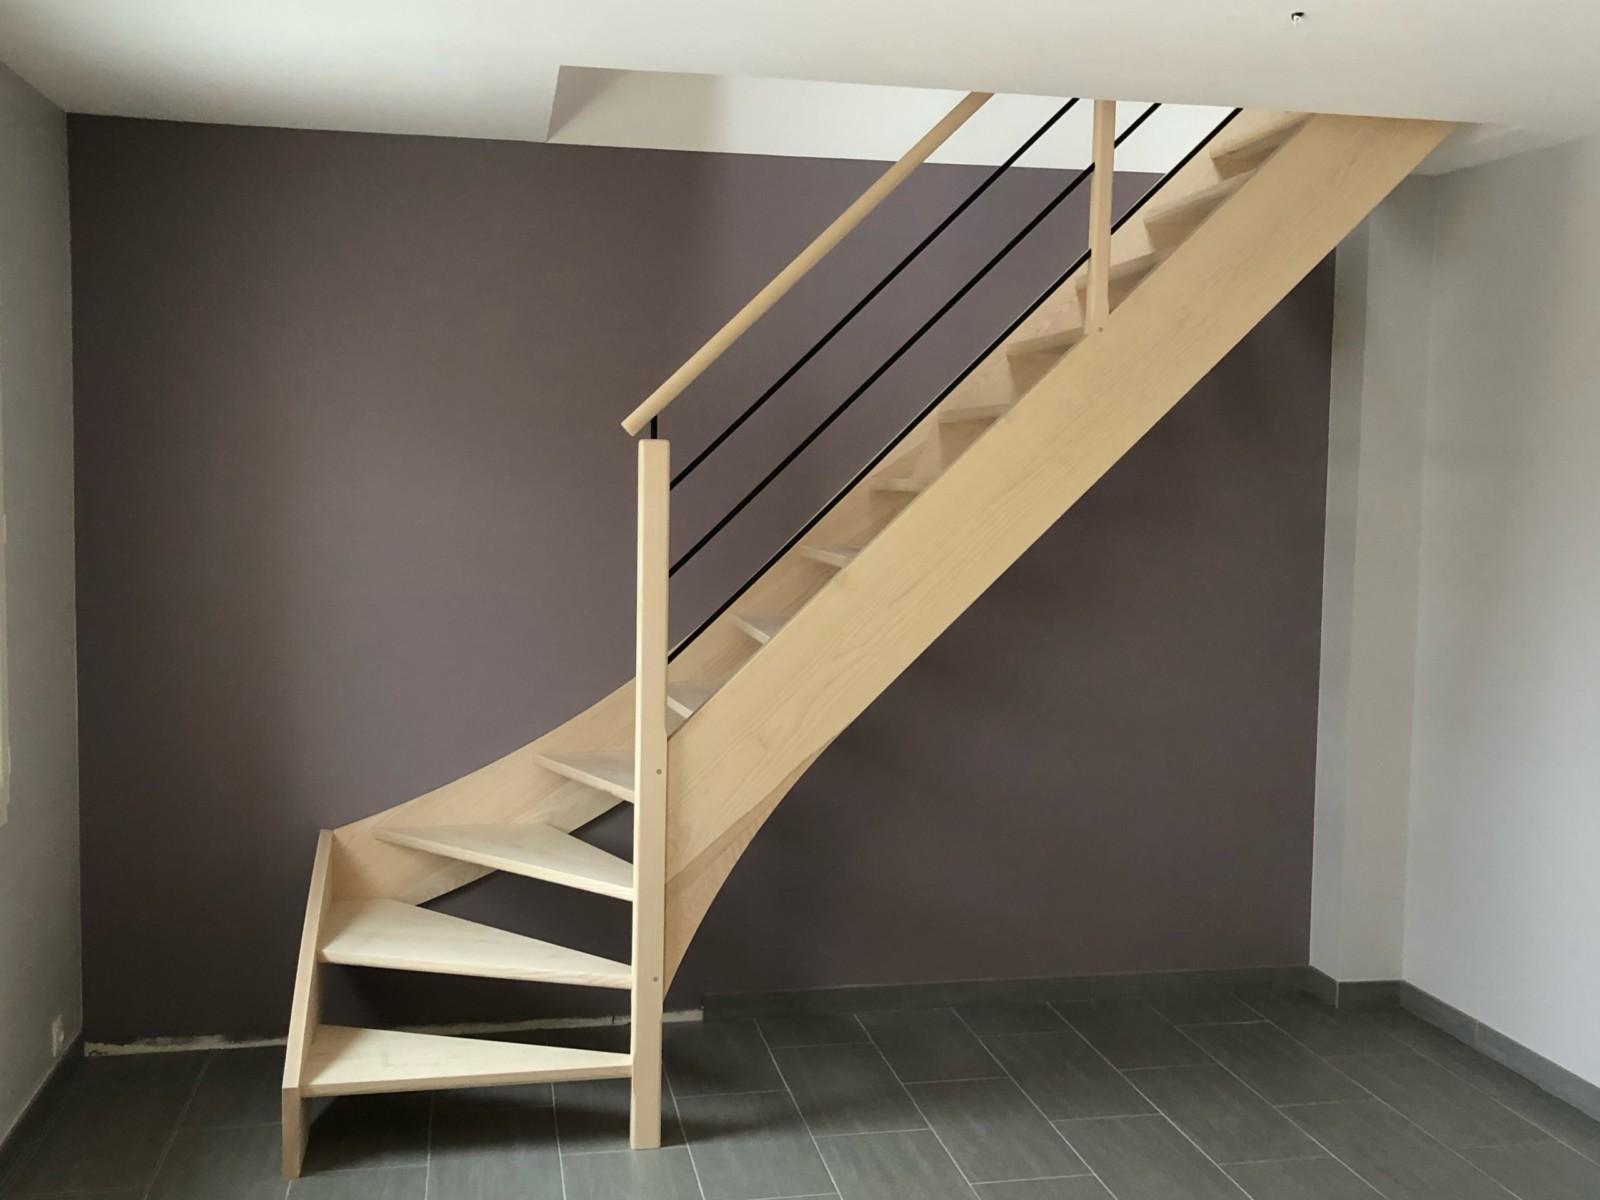 REGIS BERTHELOT Fabricant Escaliers Longue Jumelles IMG 1729